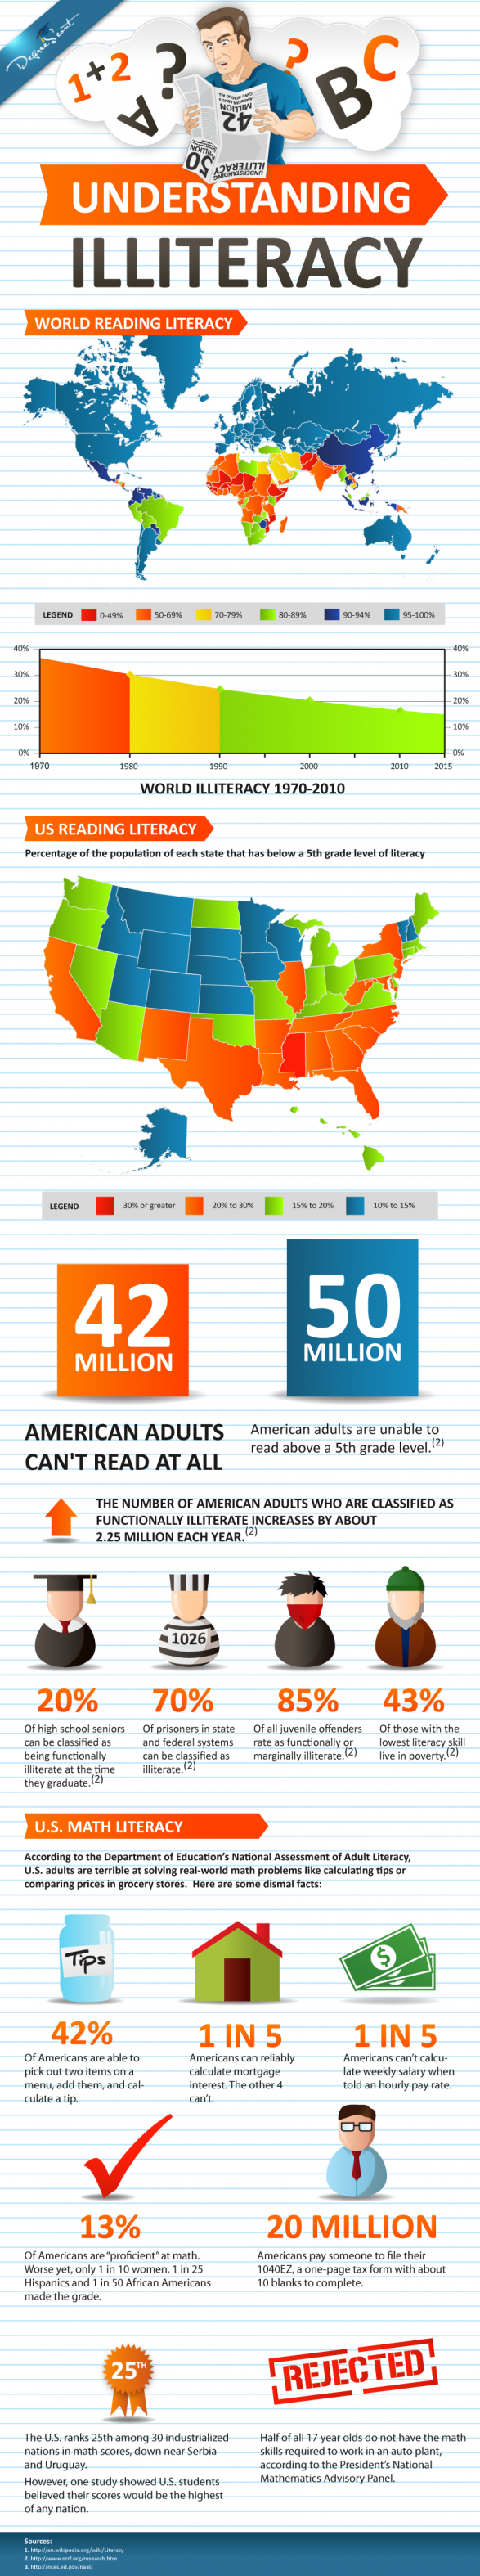 Understanding Illiteracy